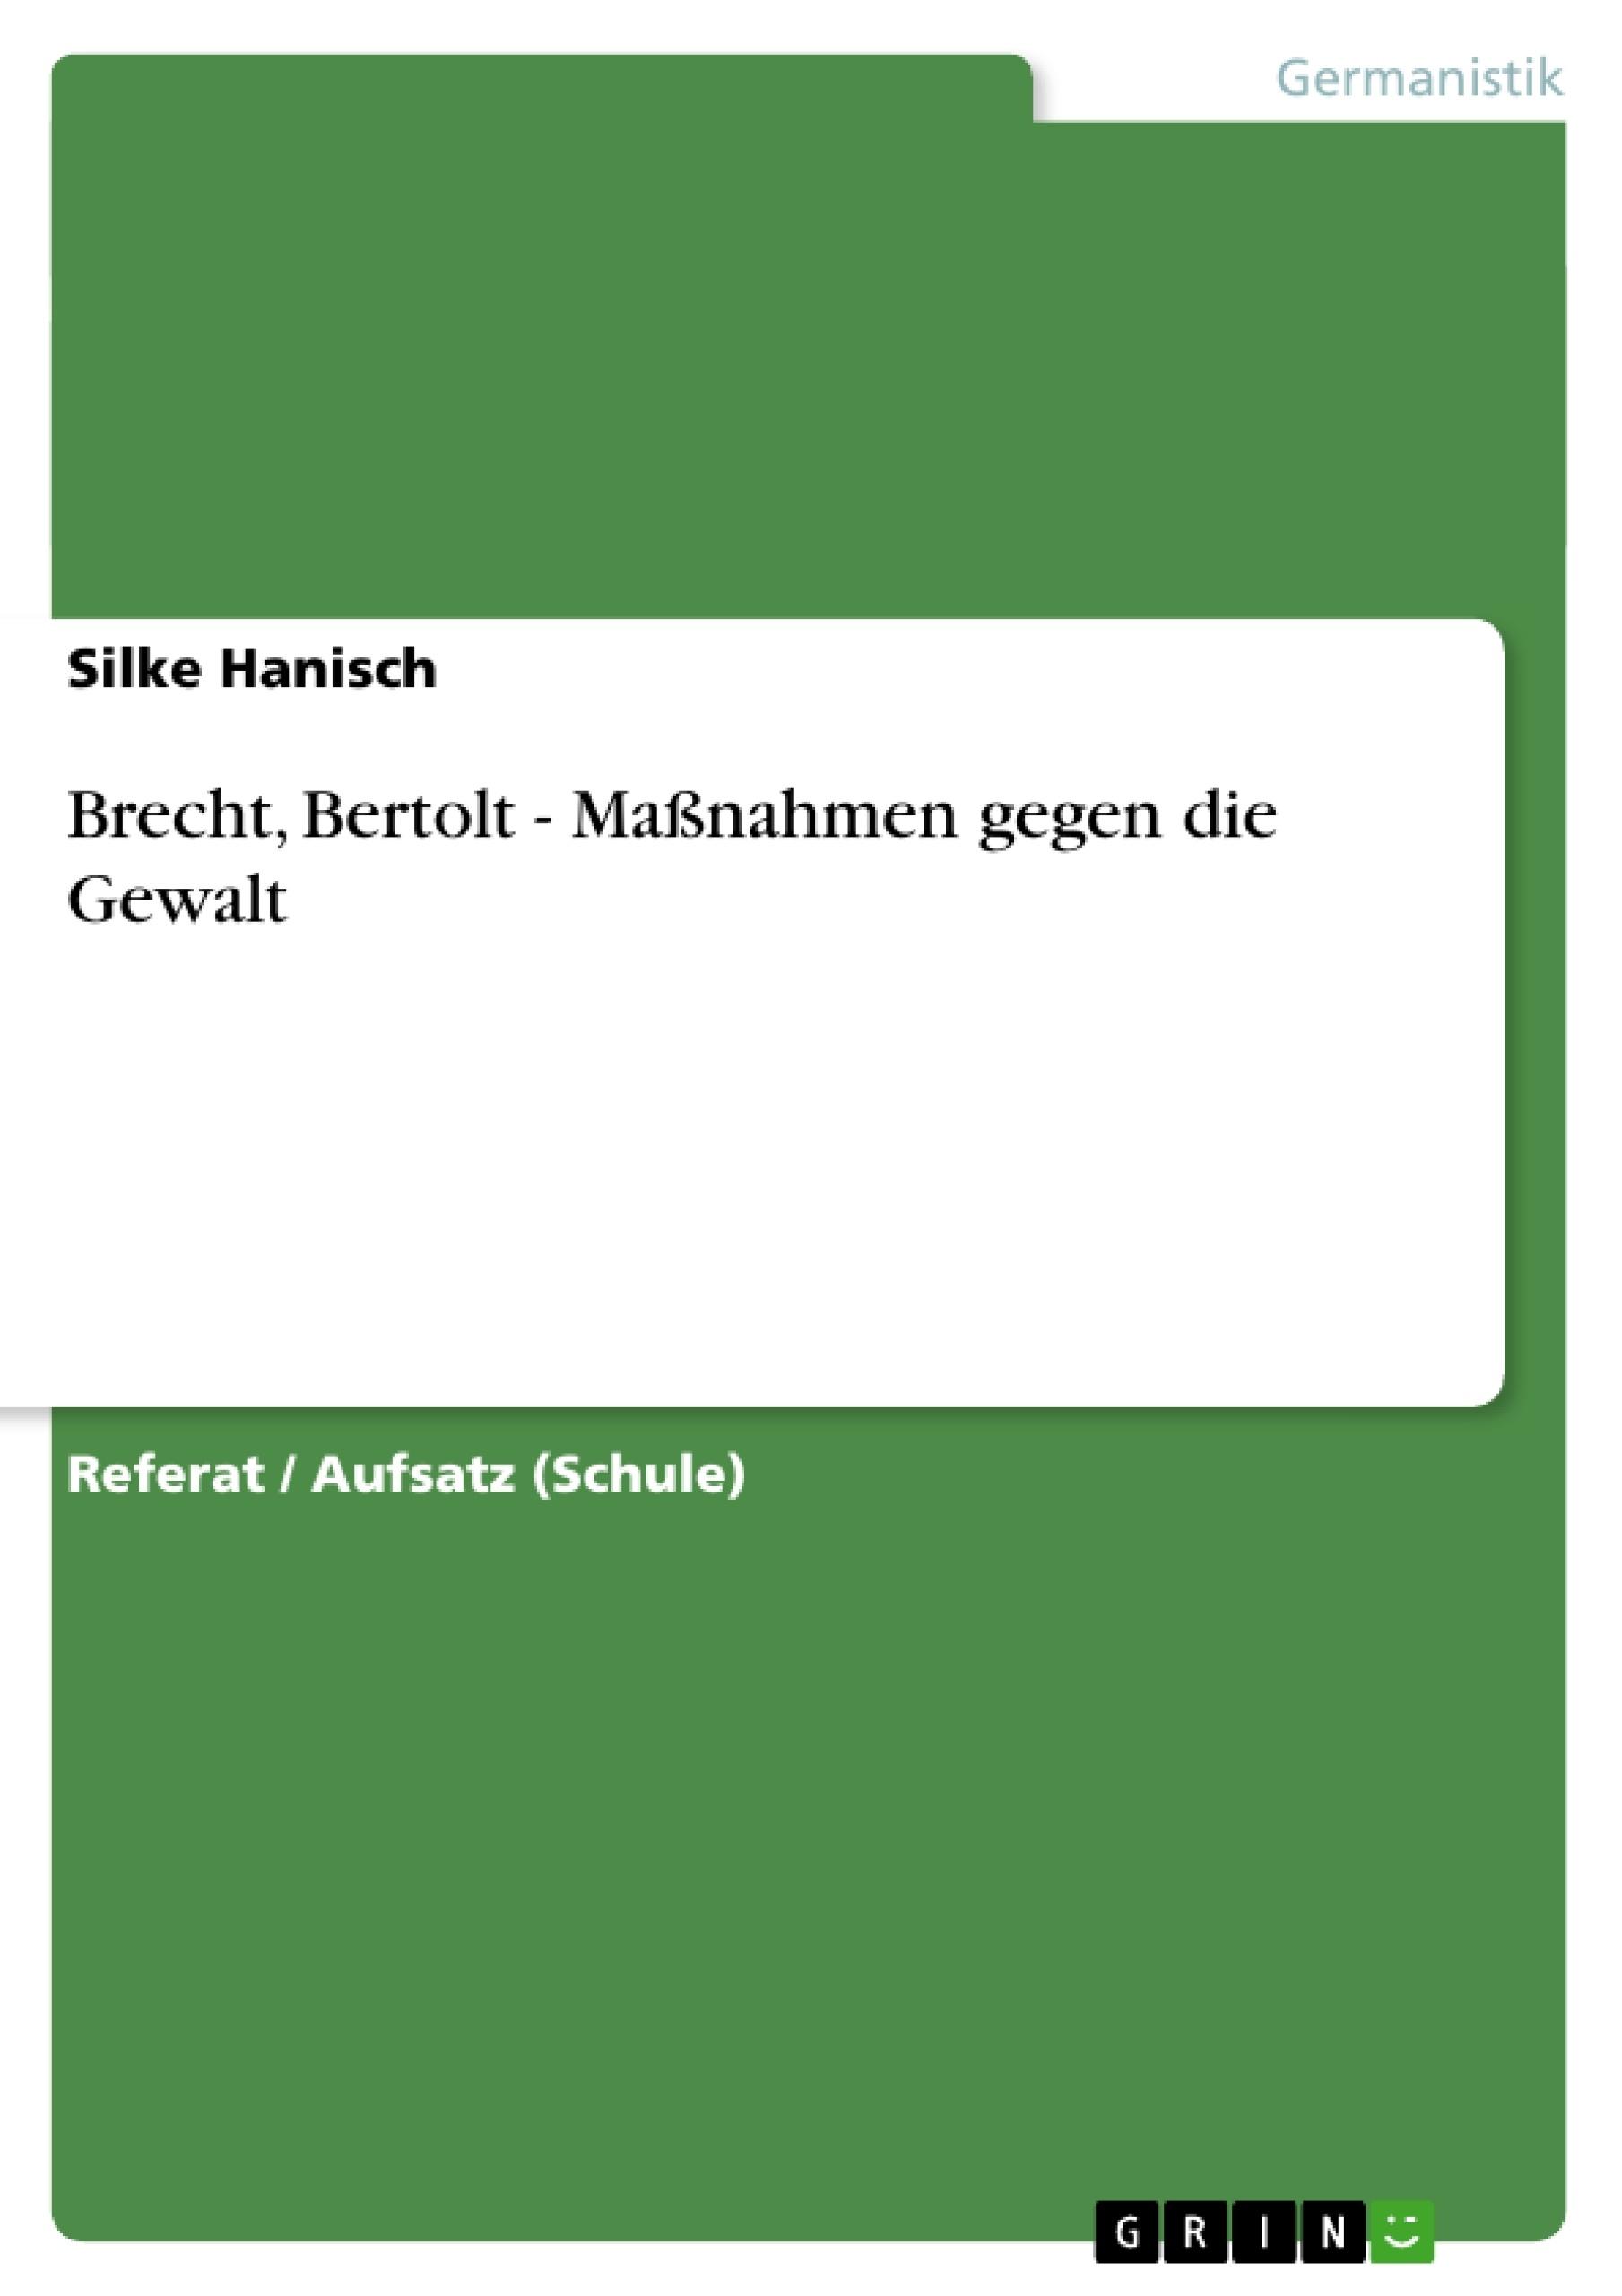 Titel: Brecht, Bertolt - Maßnahmen gegen die Gewalt